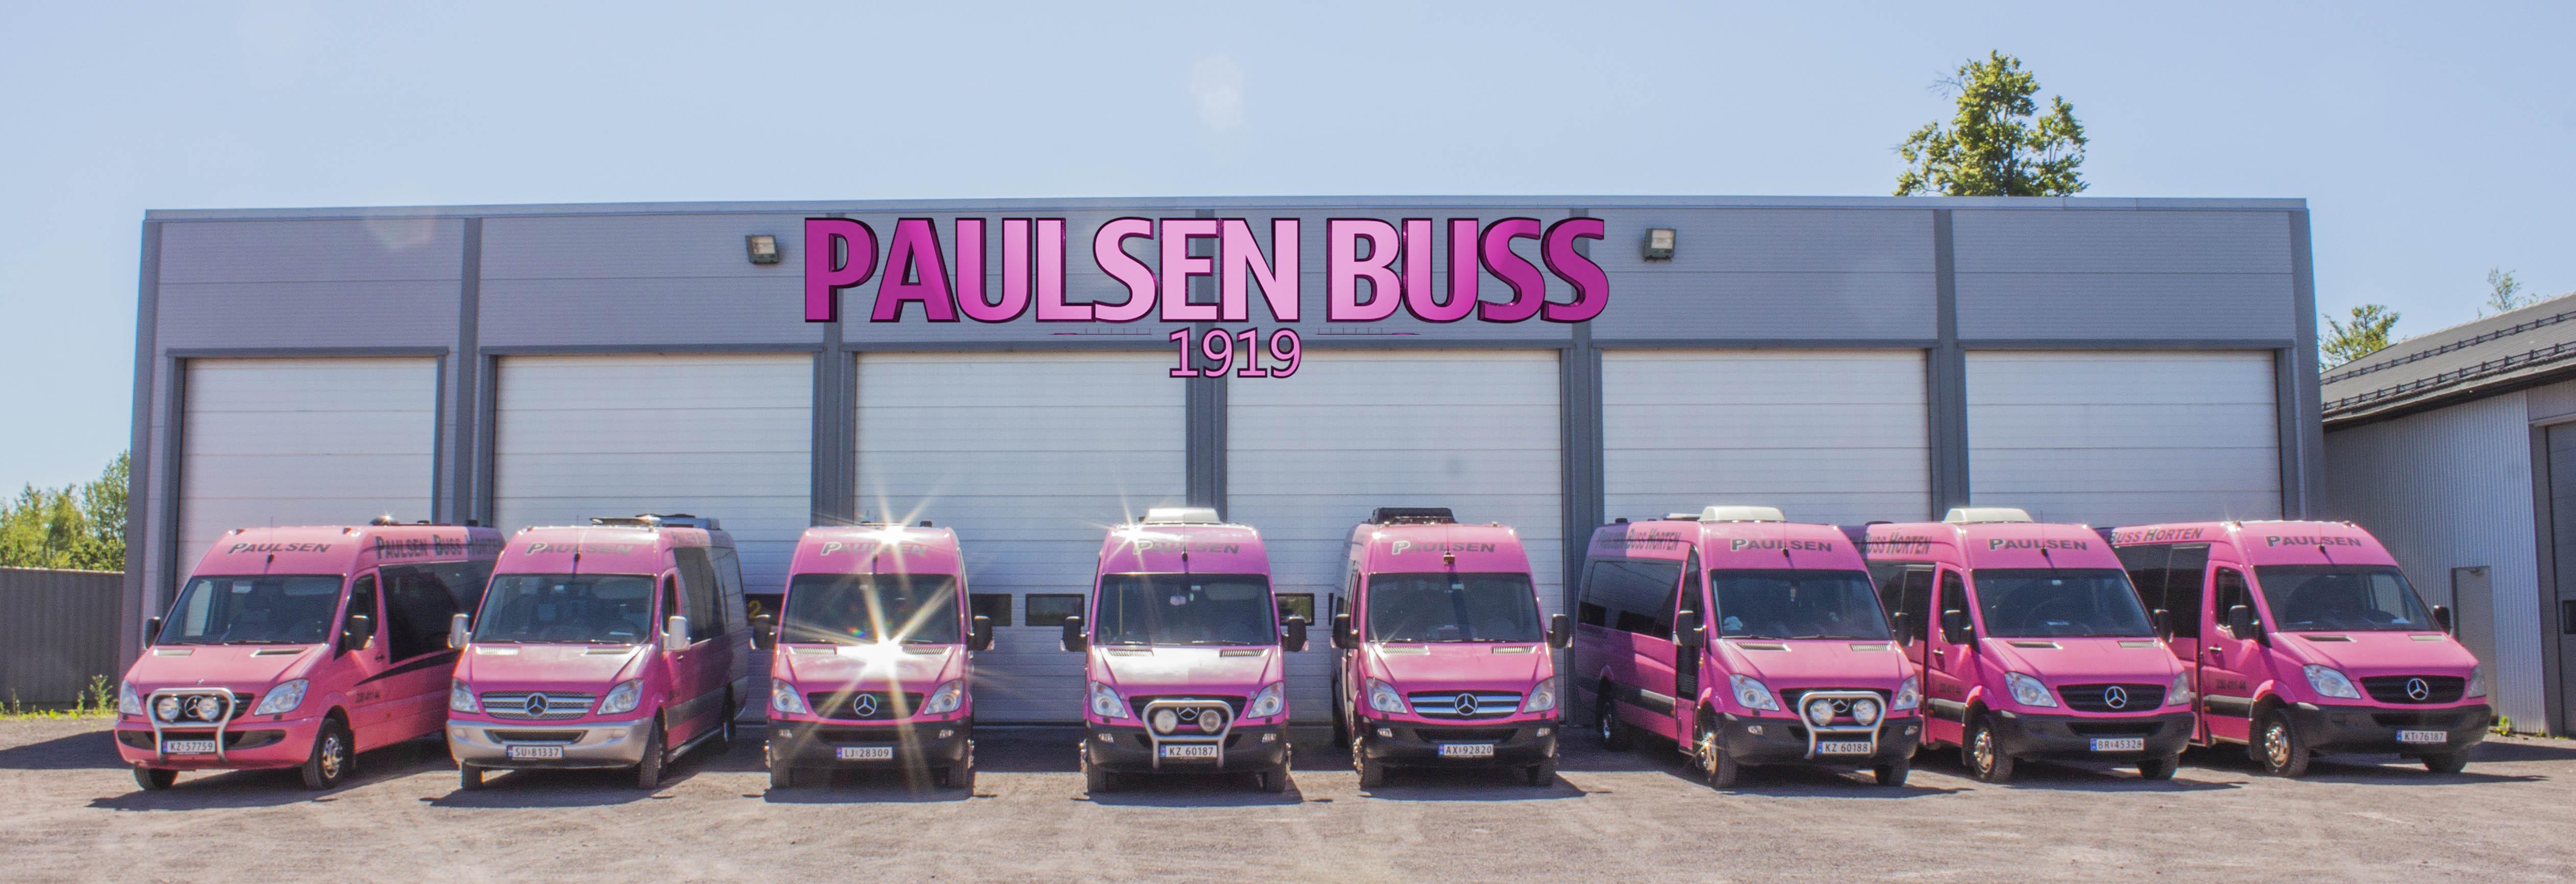 04_Minibusser_med_logo